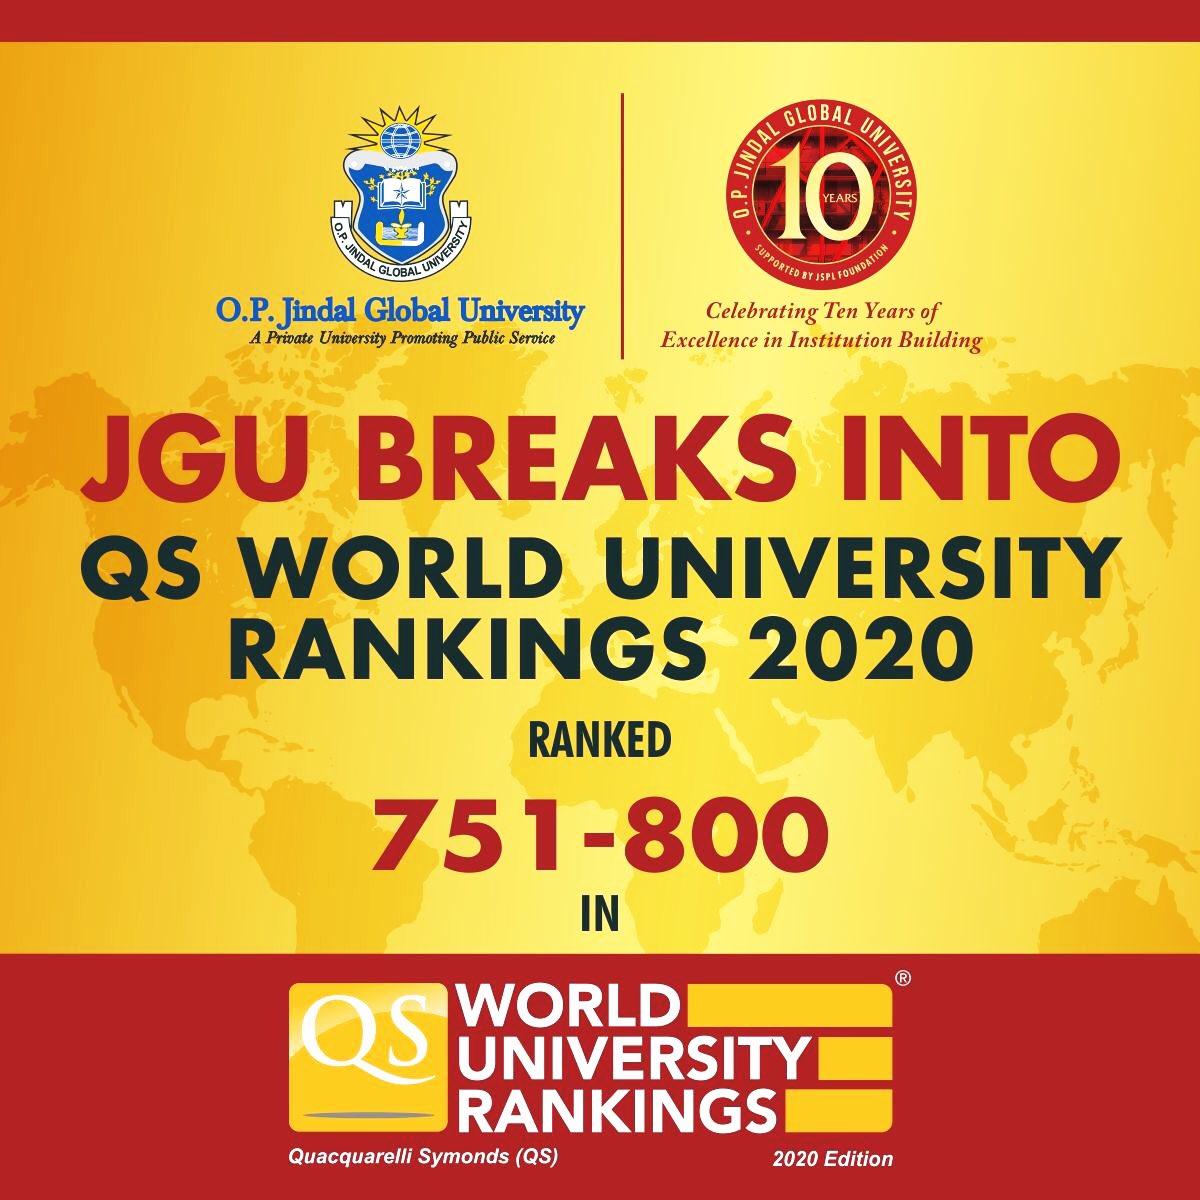 Congratulations #JGU on breaking into the world university rankings!! @JindalGlobalUni @MPNaveenJindal Dear friend VC Prof. Raj Kumar  Proud!👍🏼#JGUbreaksintoQSWUR